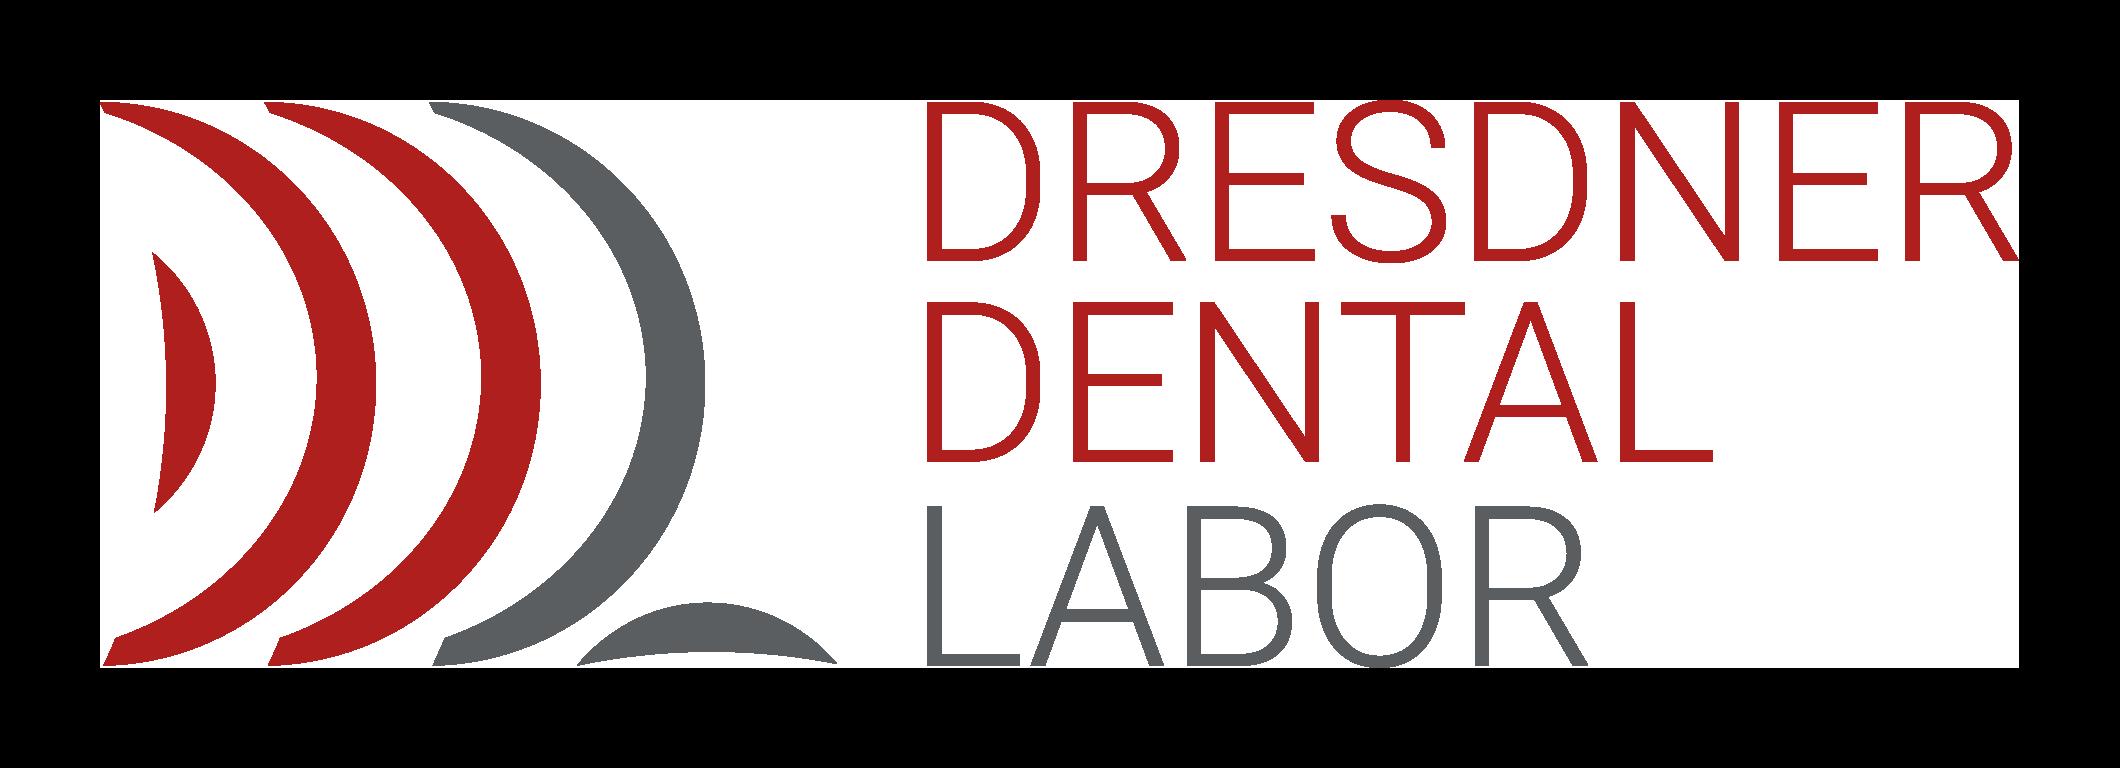 Dresdner Dental Labor